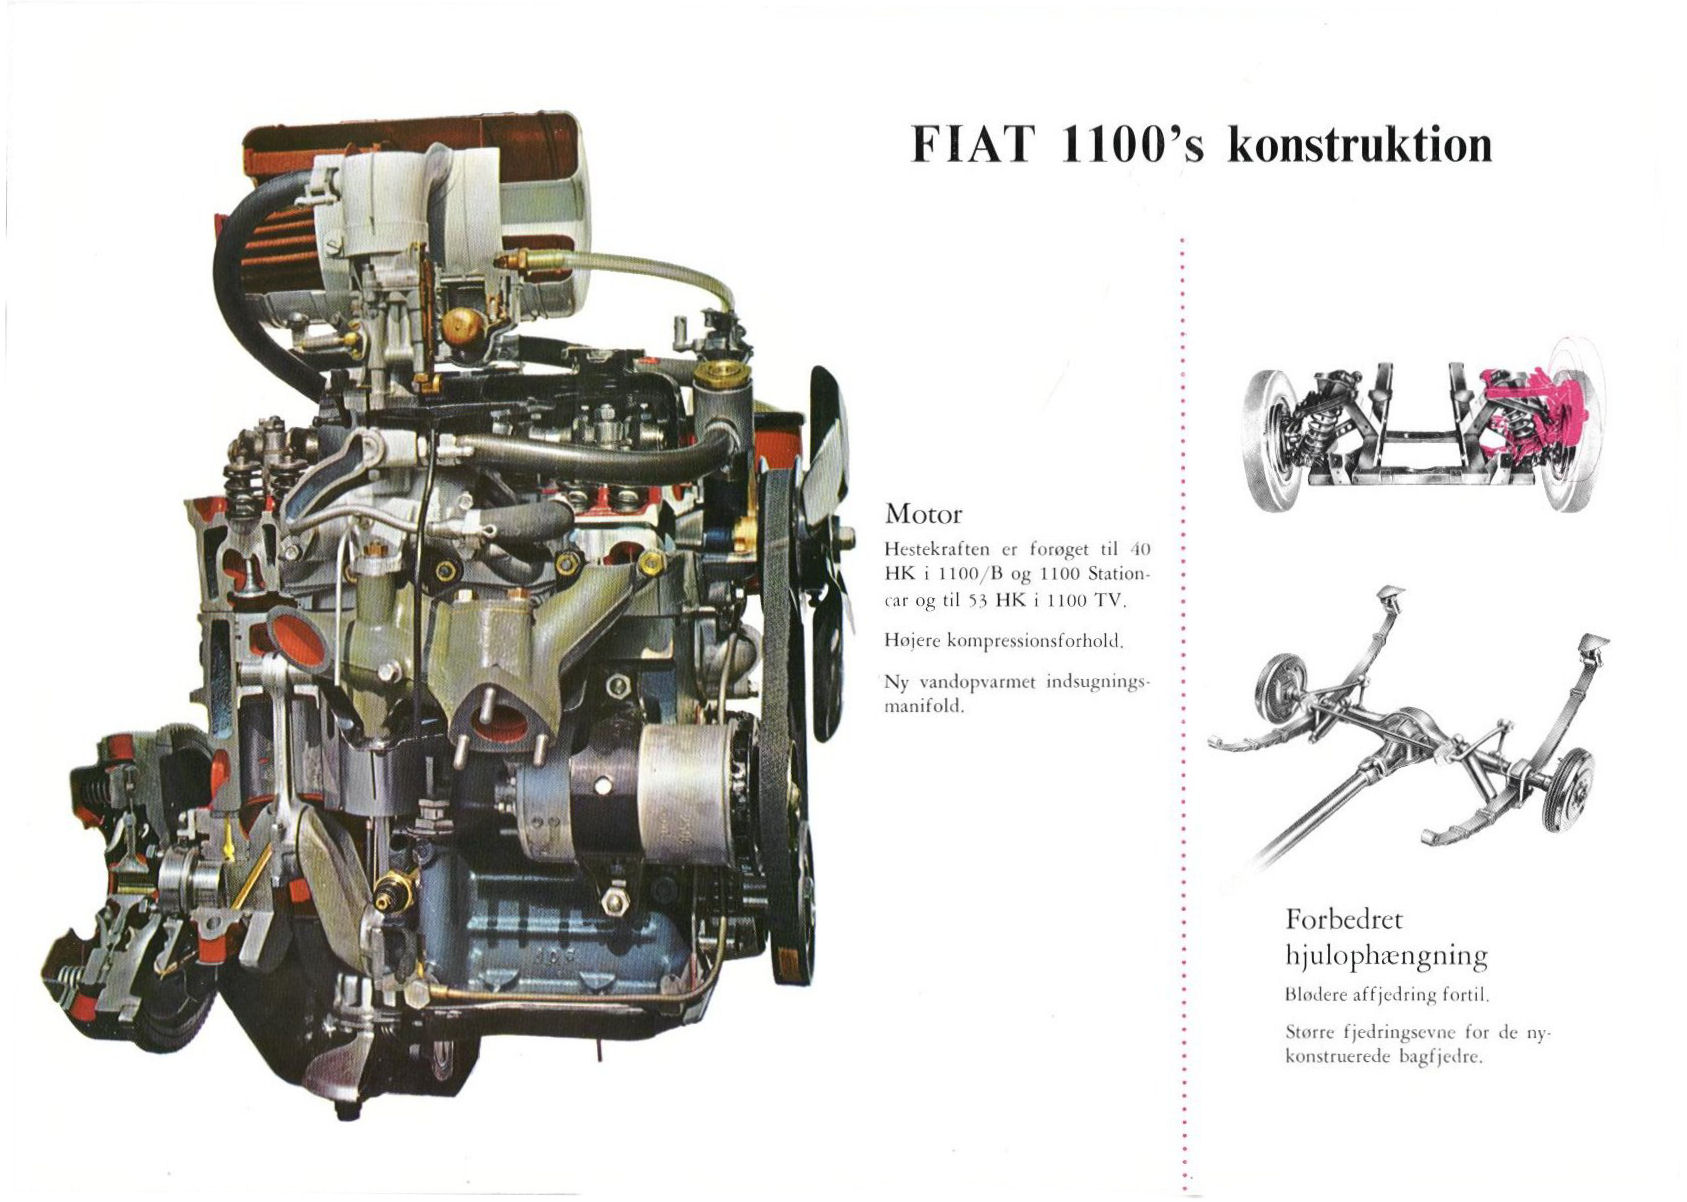 1956 Fiat 1100 Brochure